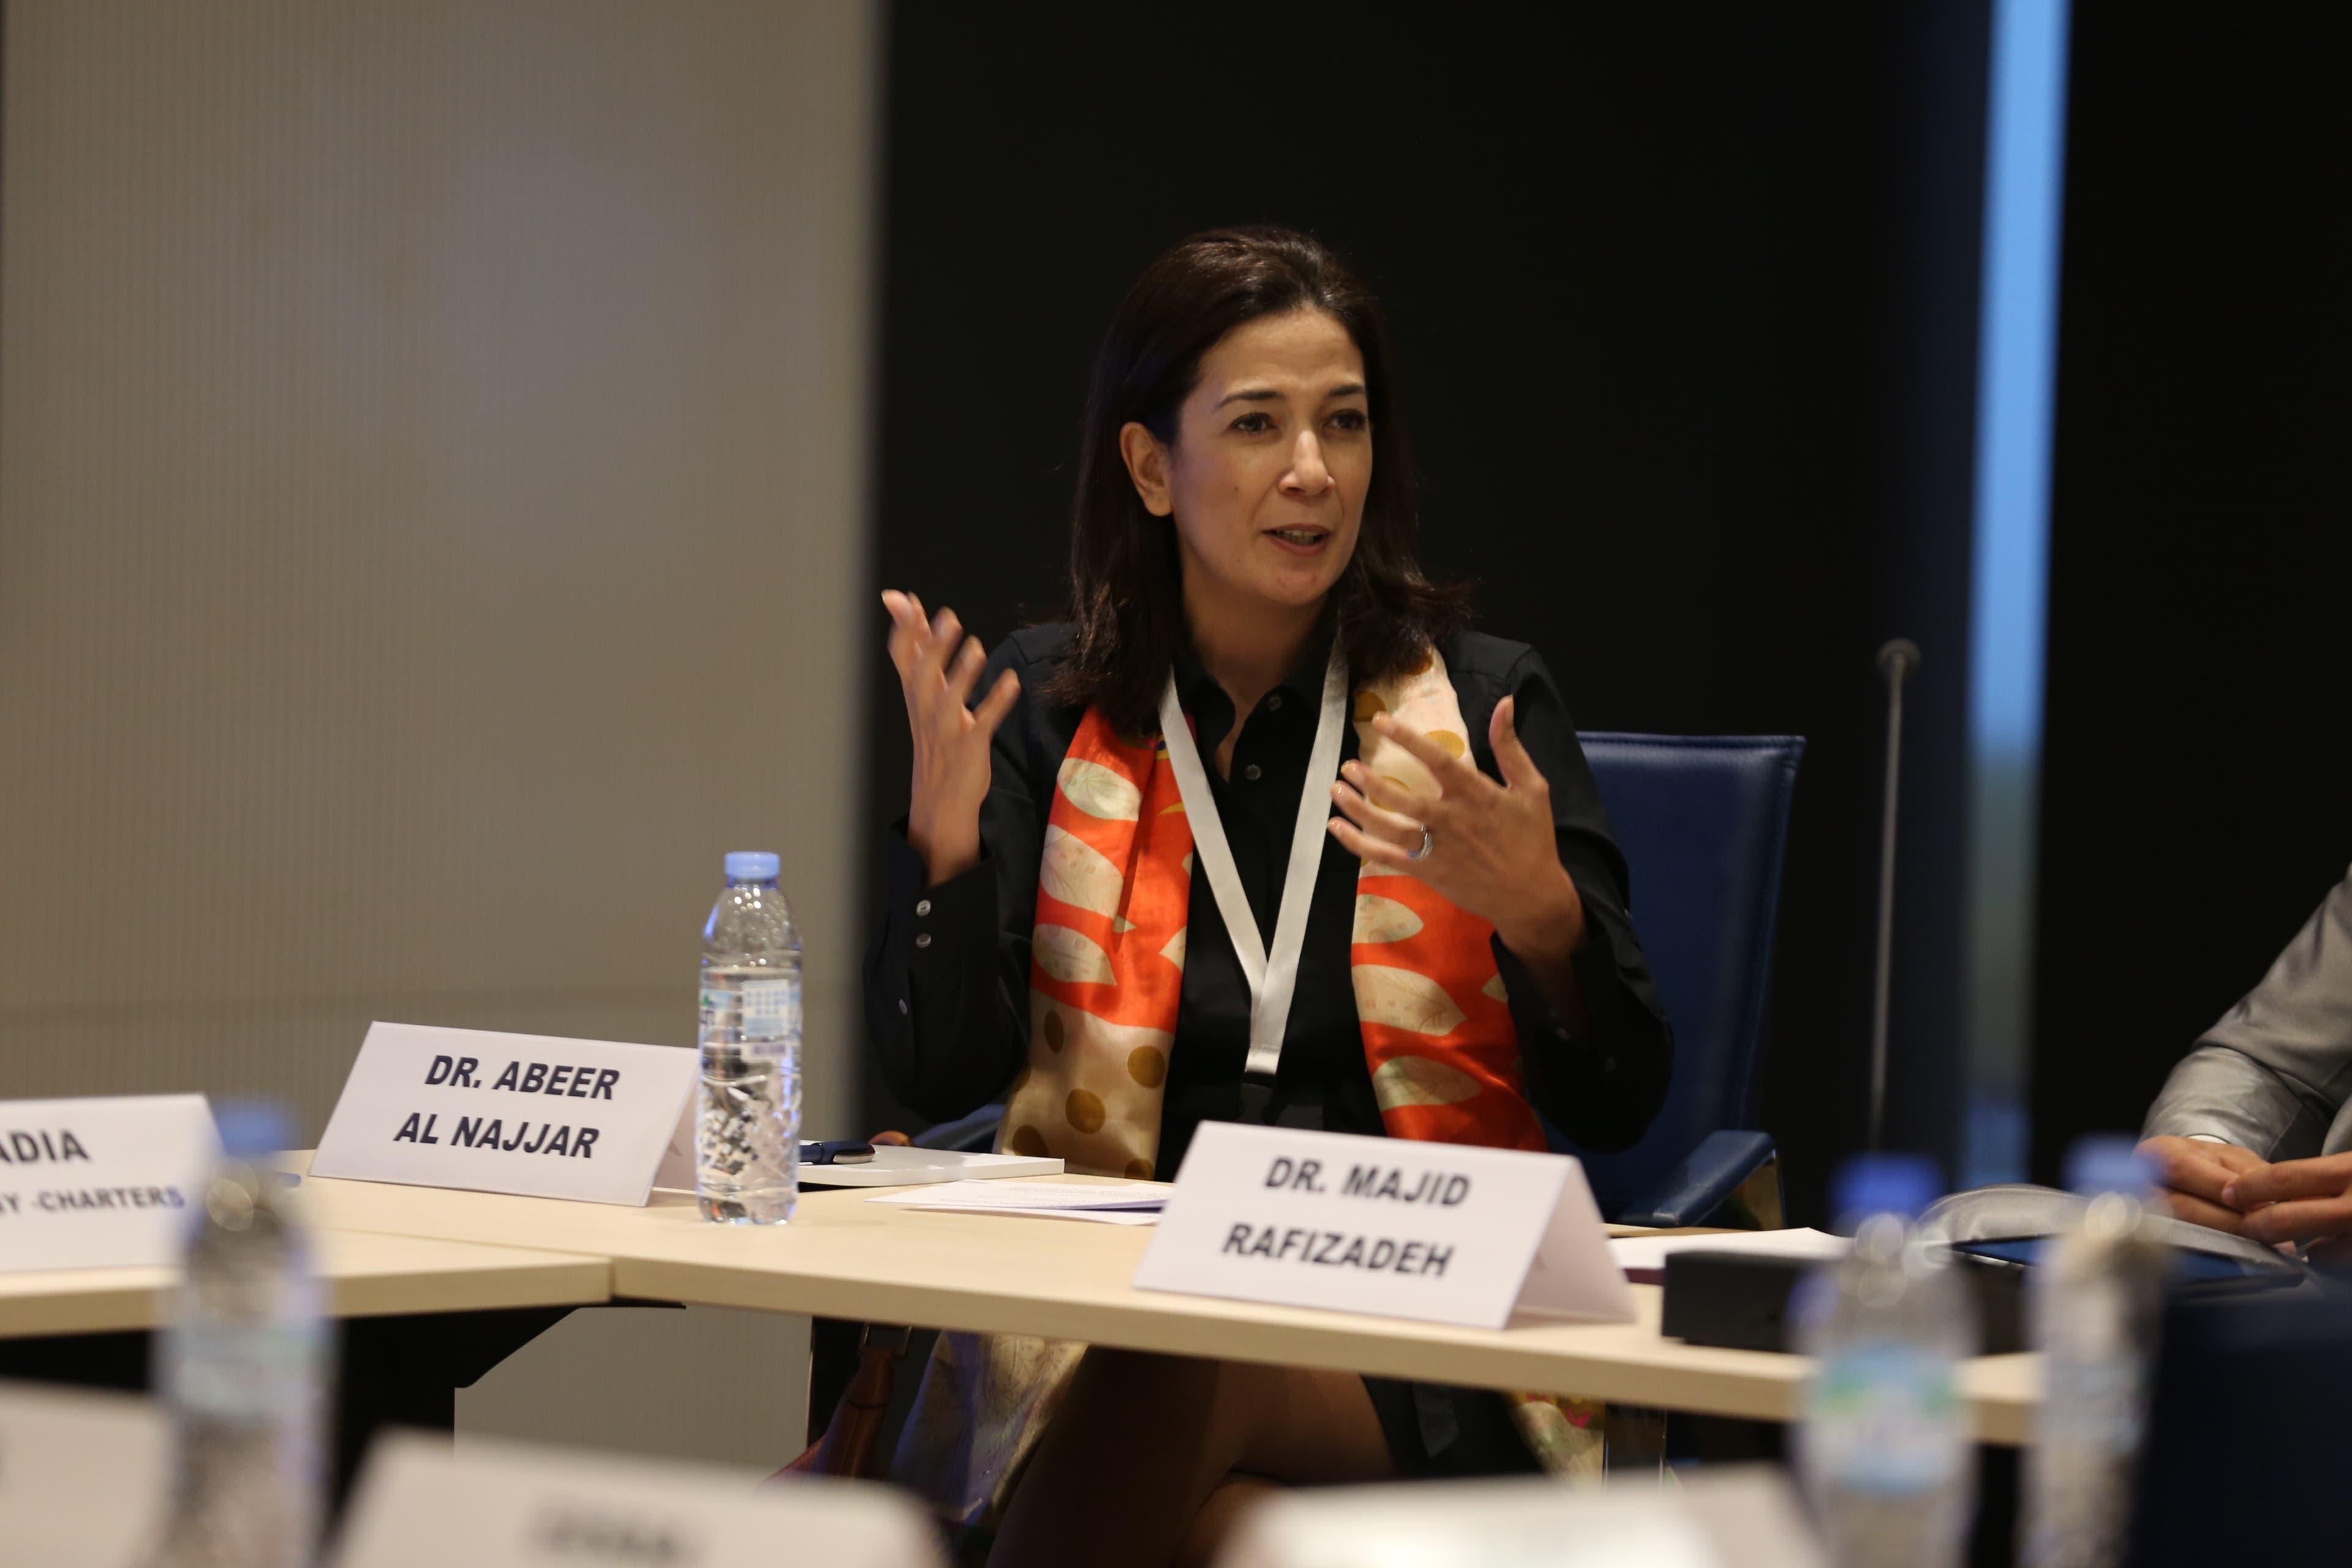 Abeer al-Najjar, a professor of media studies at the American University of Sharjah. (Al Arabiya News)